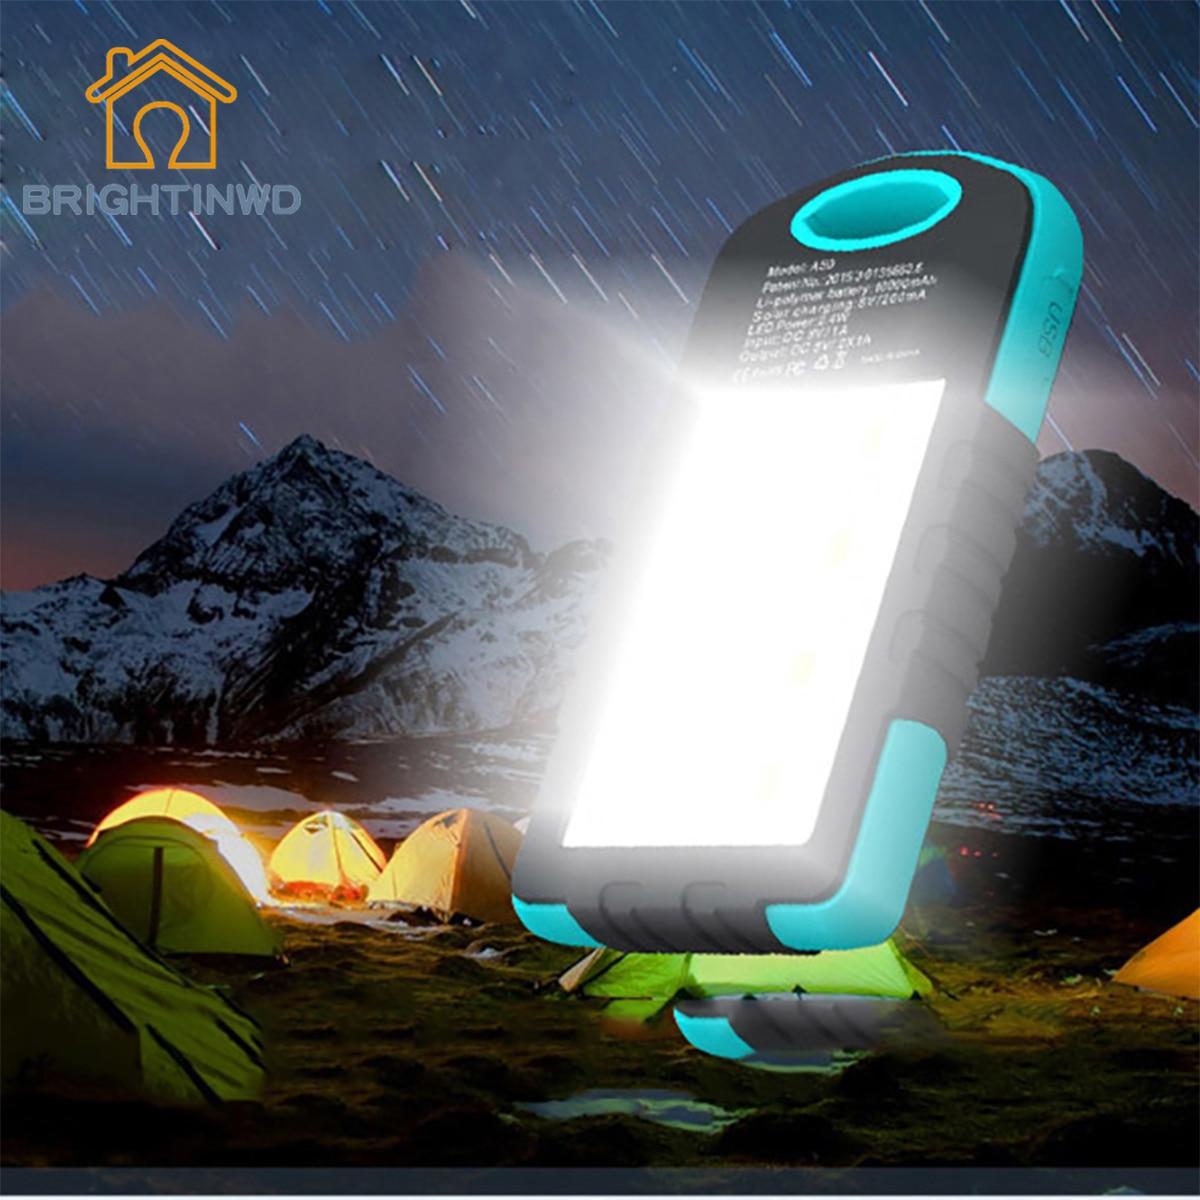 LED Solar Power Camping Lamp Outdoor LED Flashlight 3000mAh Solar Power Bank For Phone Portable Lanterns BRIGHTINWD